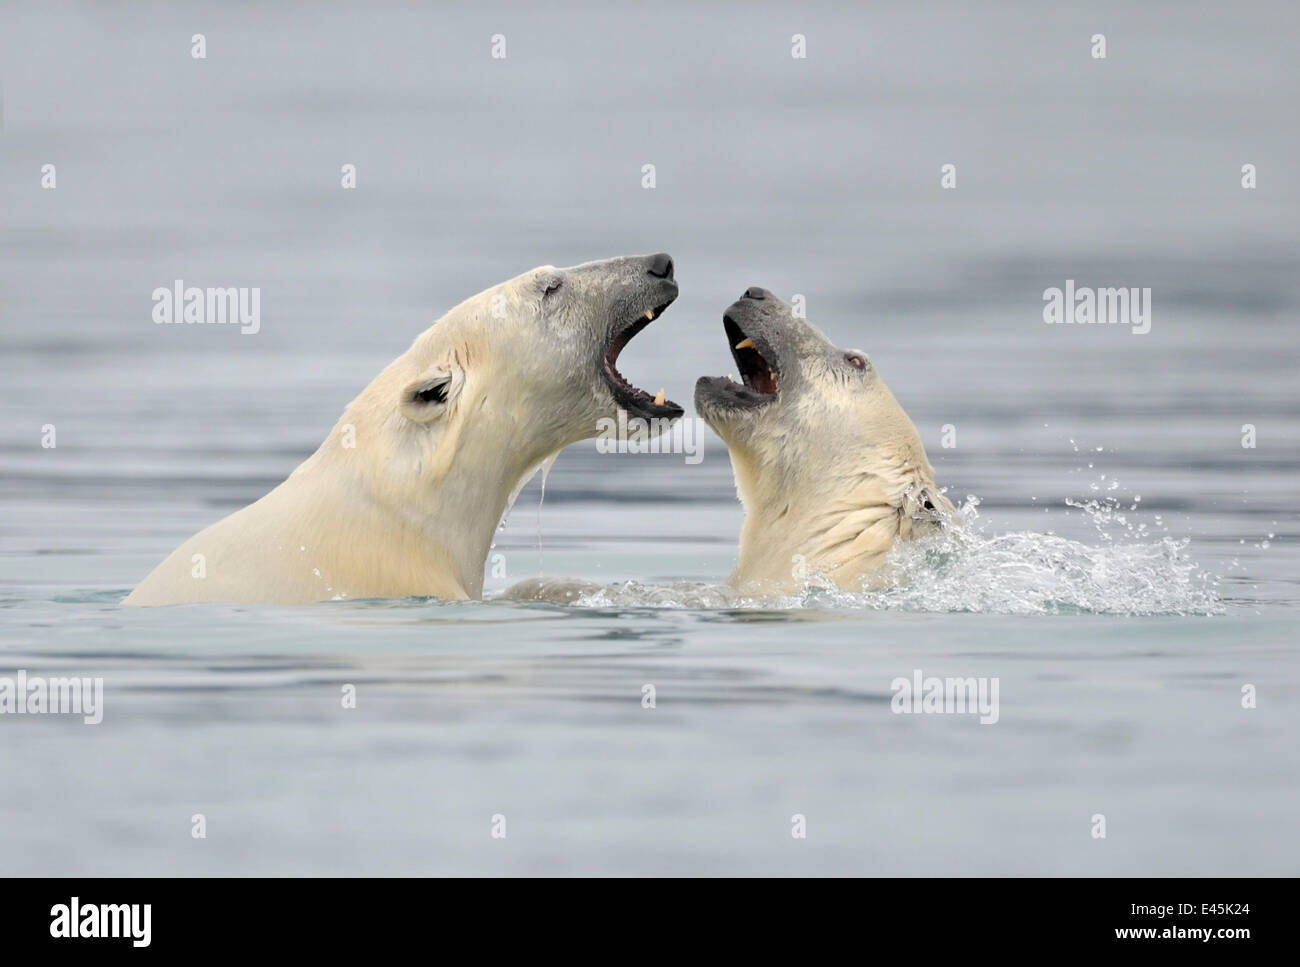 Polar Bear (Ursus maritimus) mother and cub playing in water, Svalbard, Norway, September 2009 - Stock Image